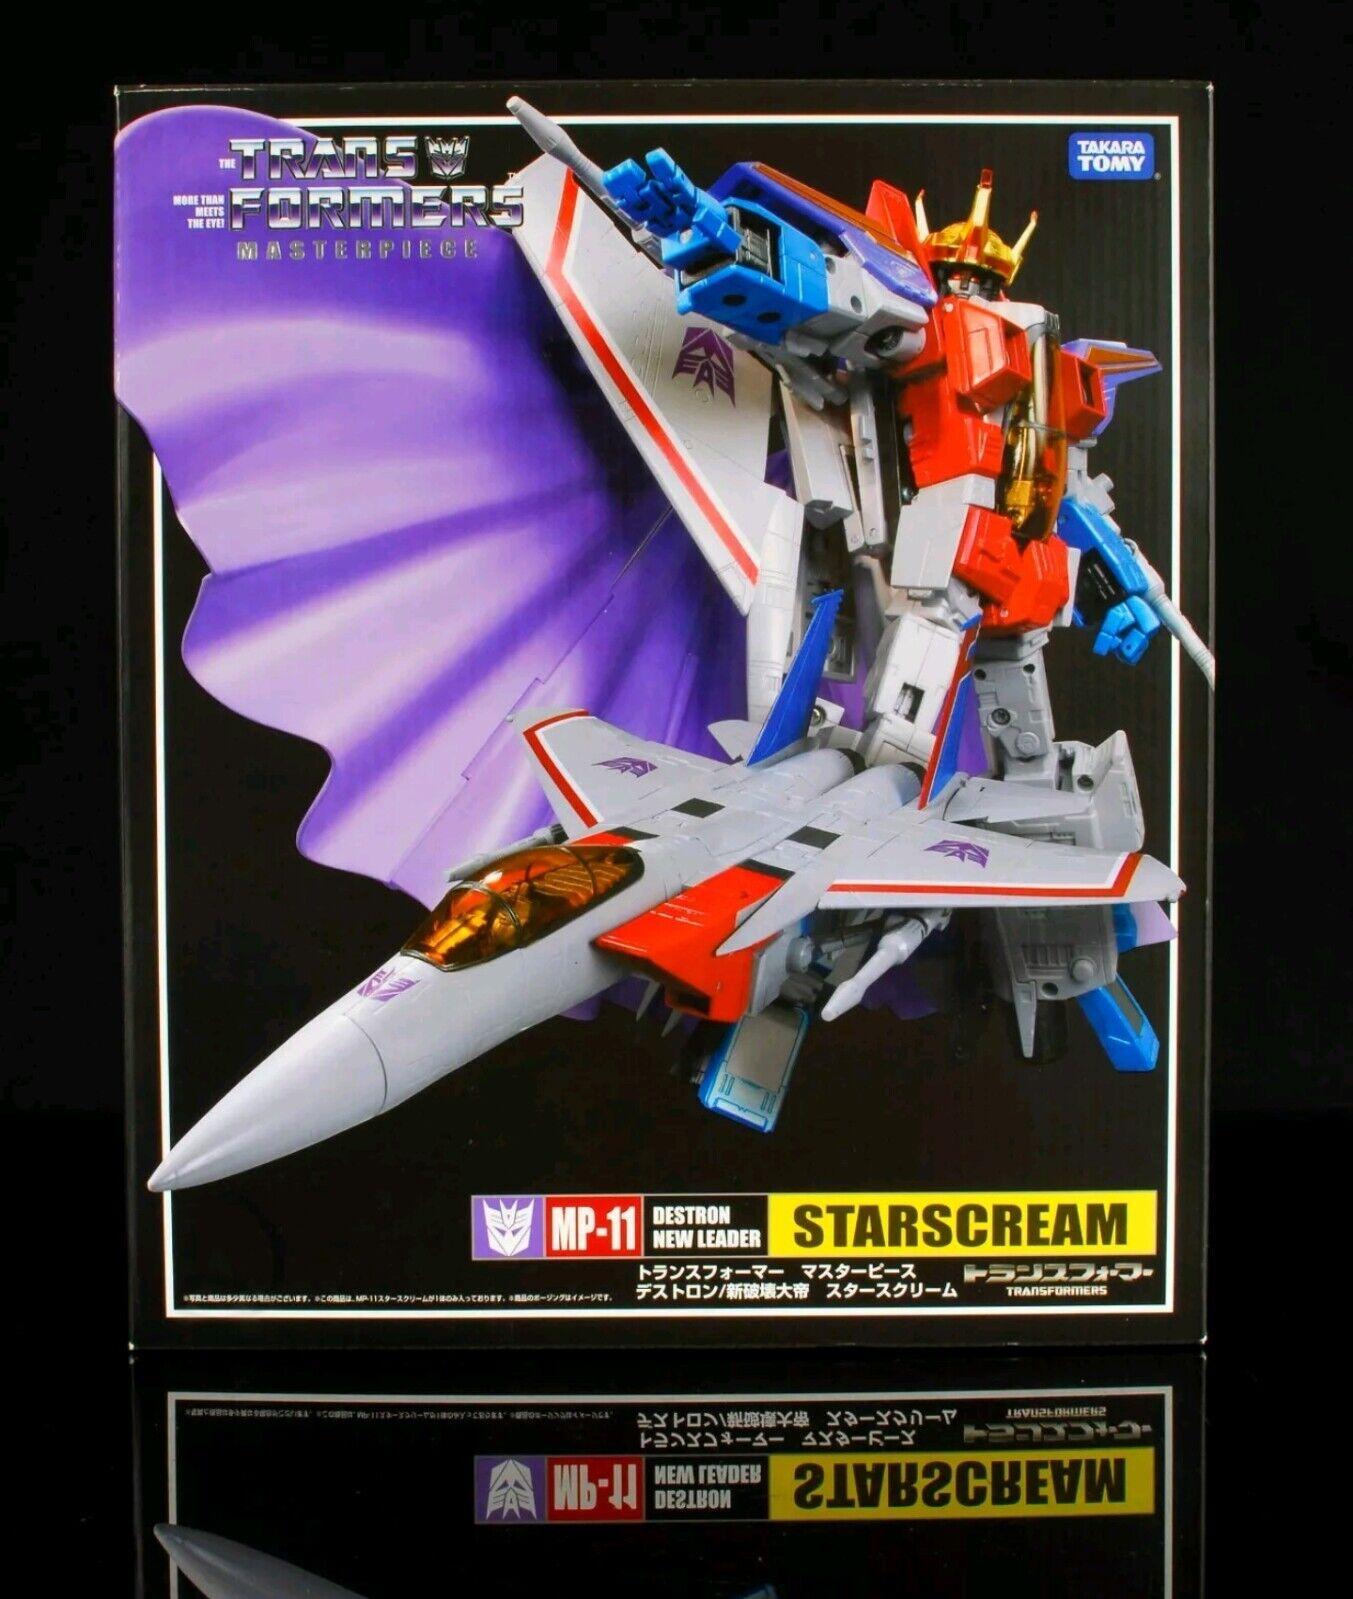 Starscream MP-11 SEALED Transformers Masterpiece US SELLER MIB New